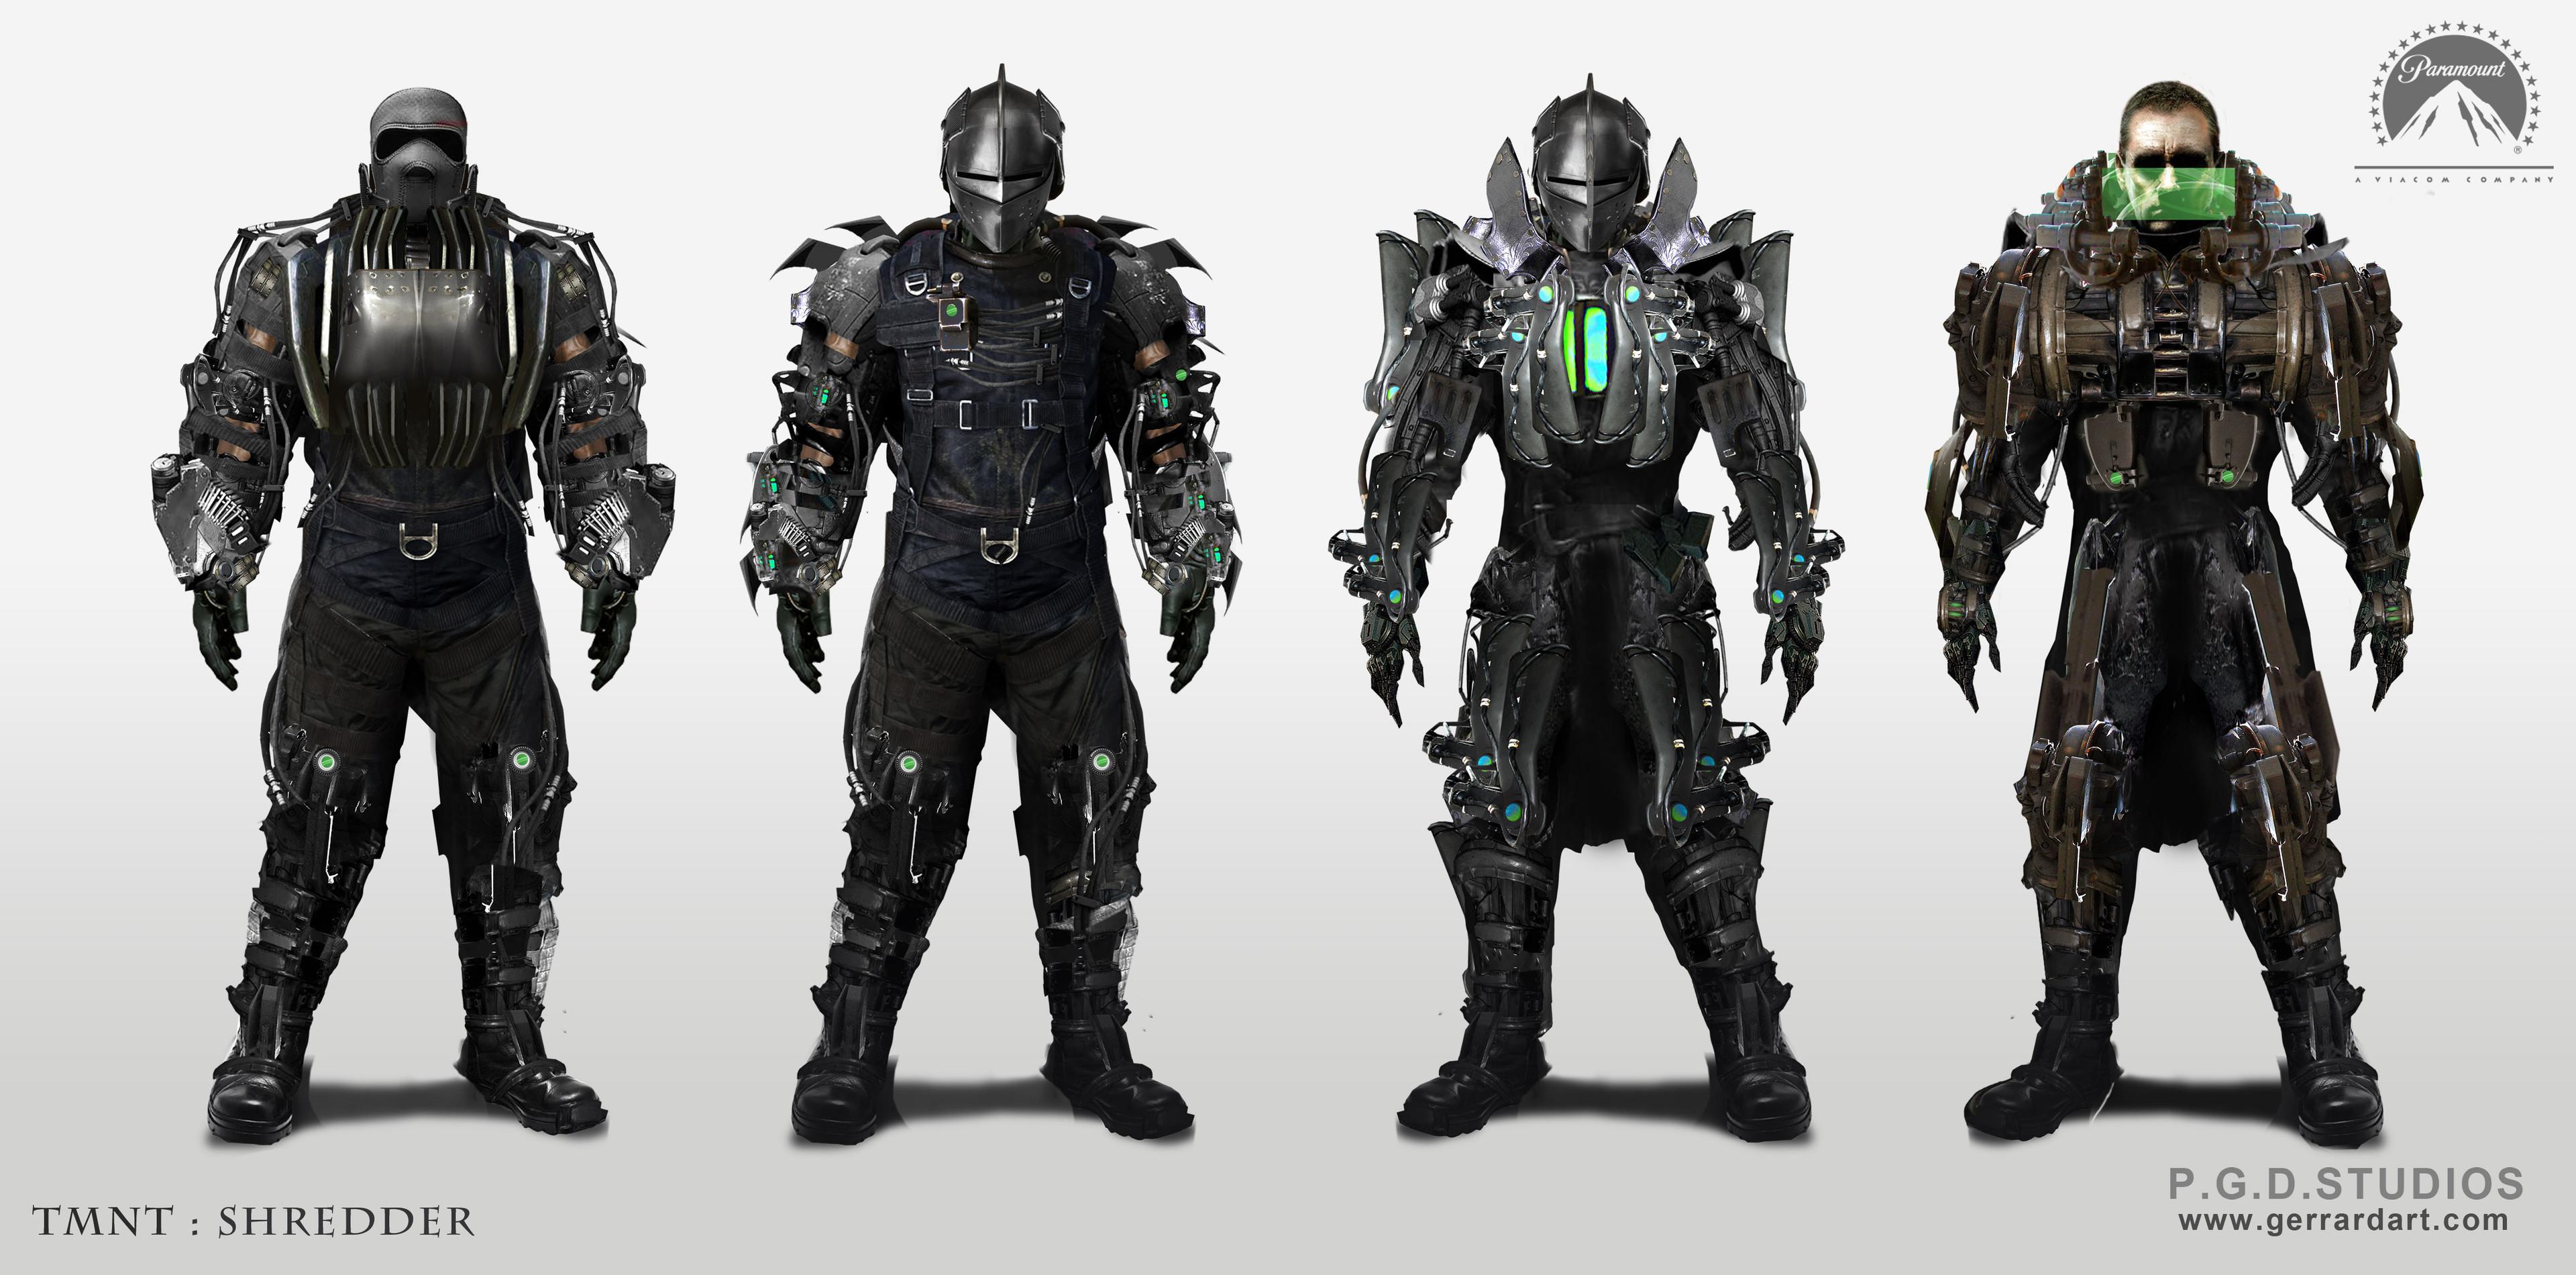 TMNT Costume Design set 2